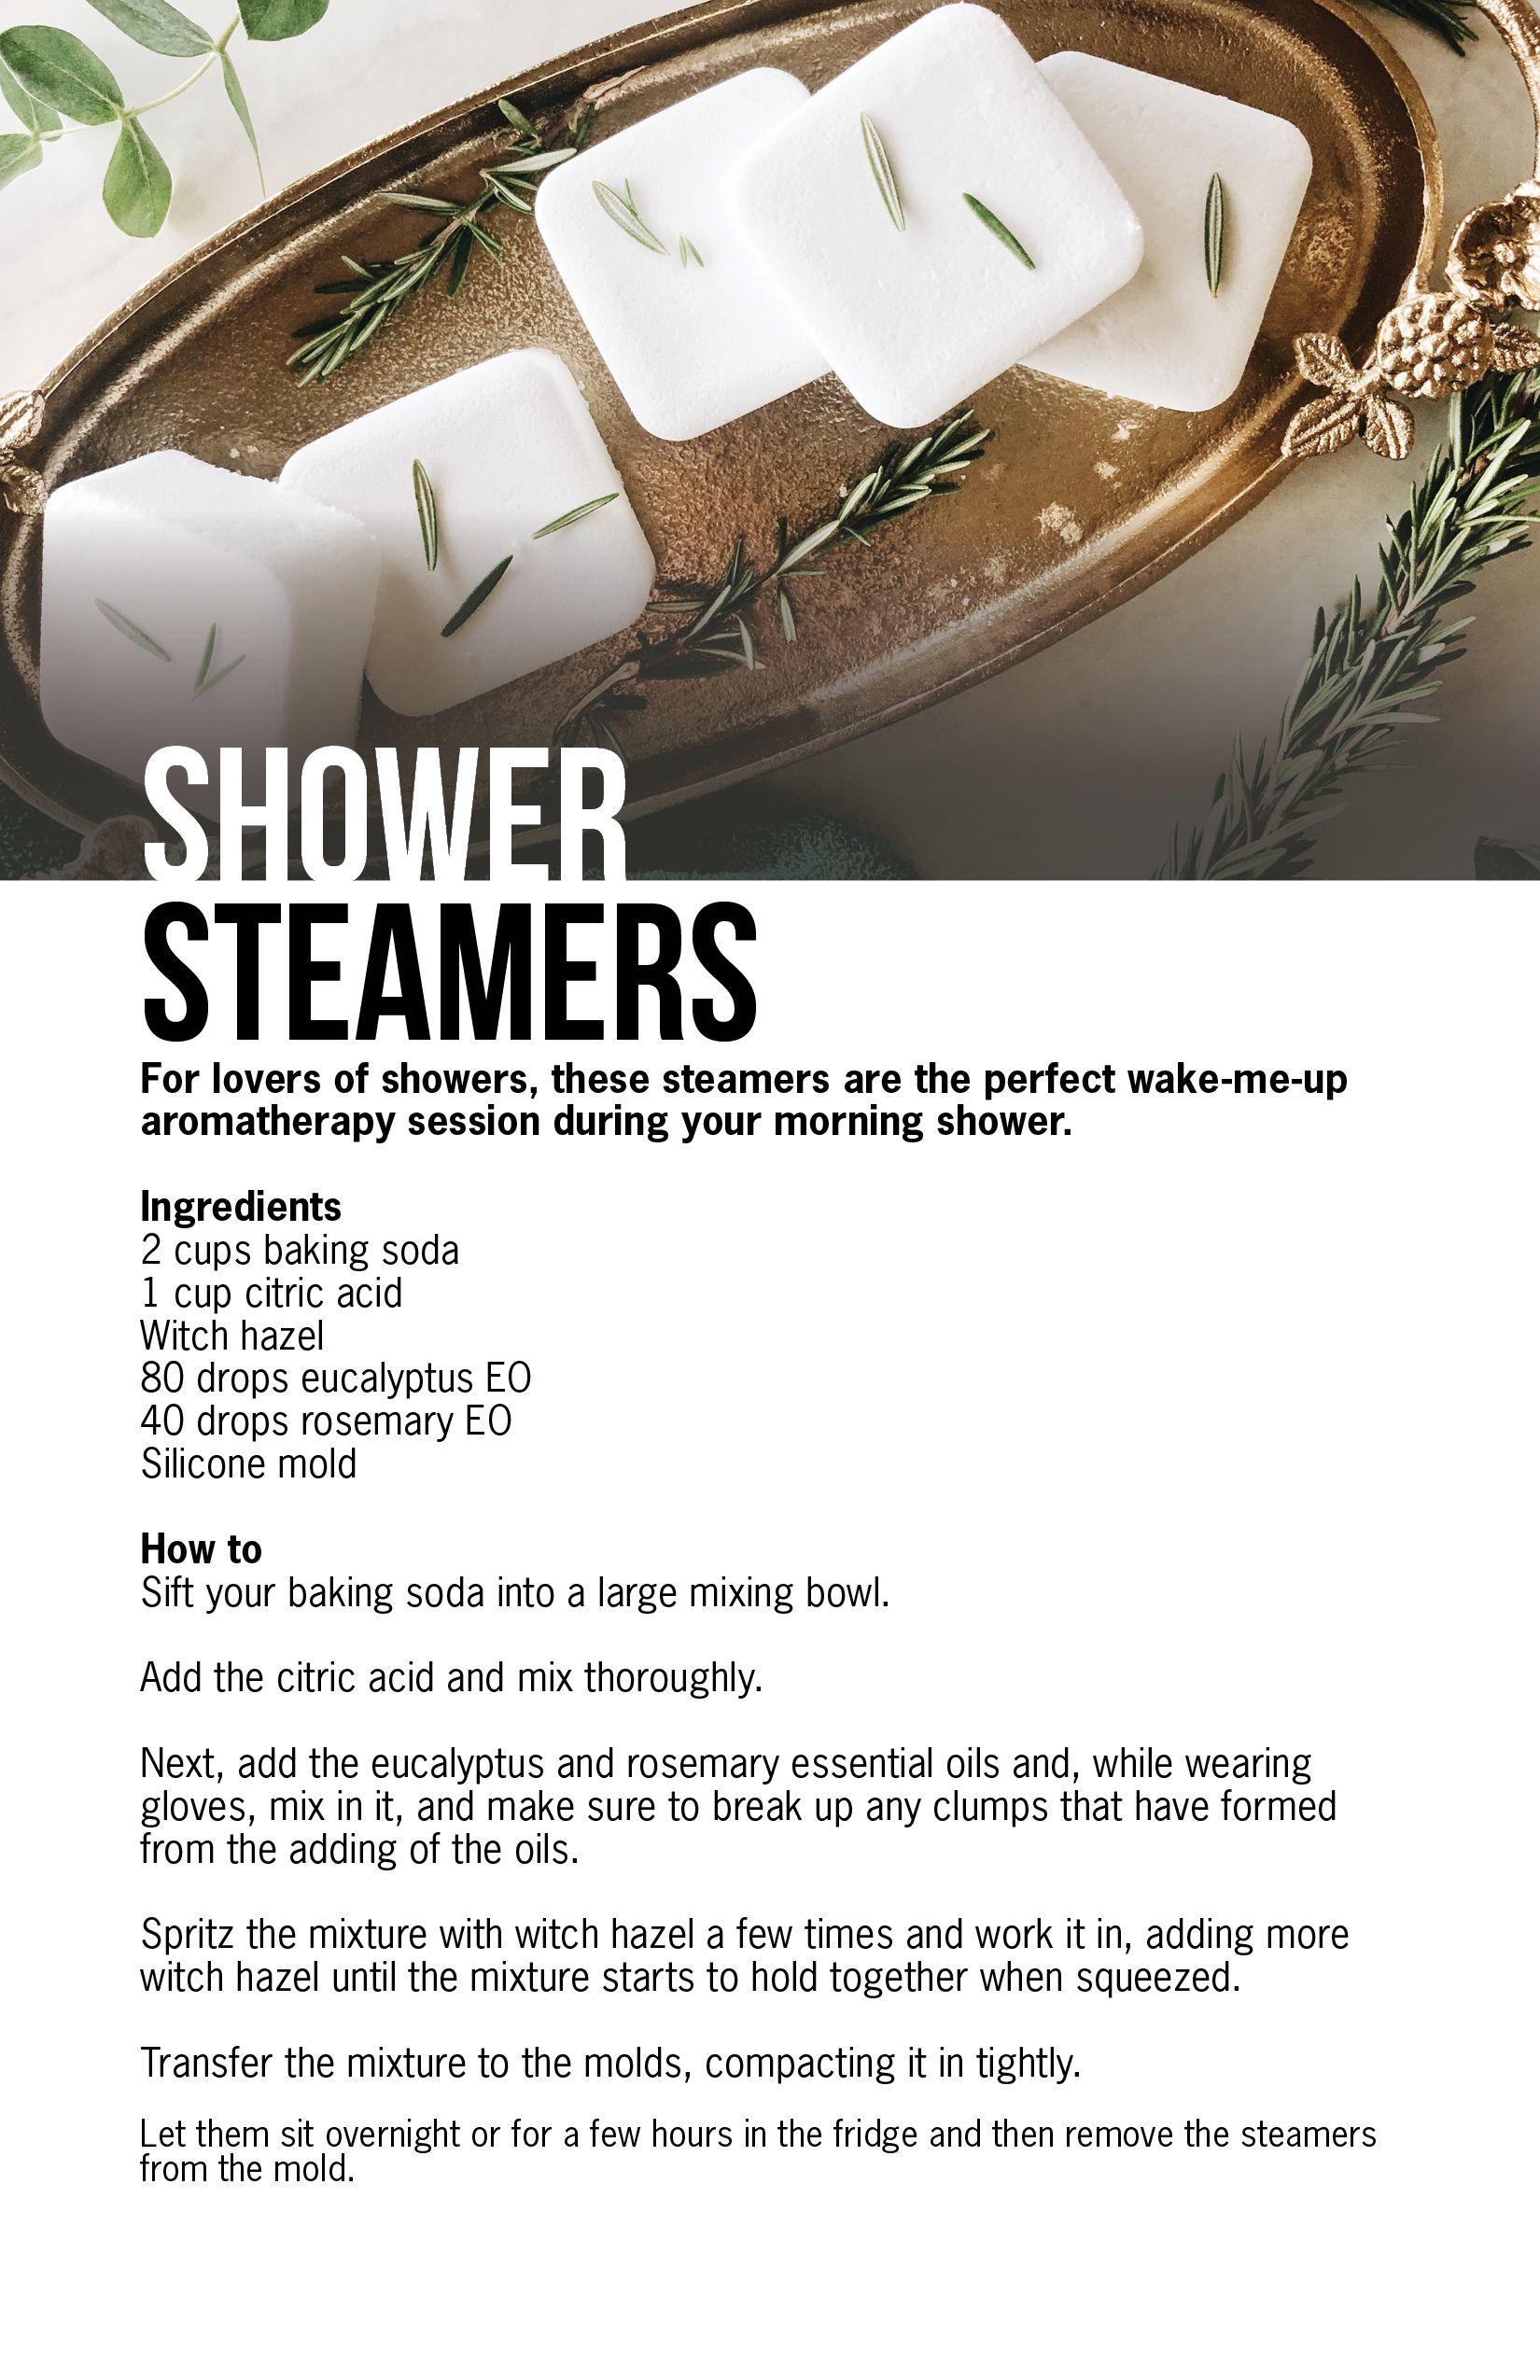 ♥ Make Shower Steamers ♥